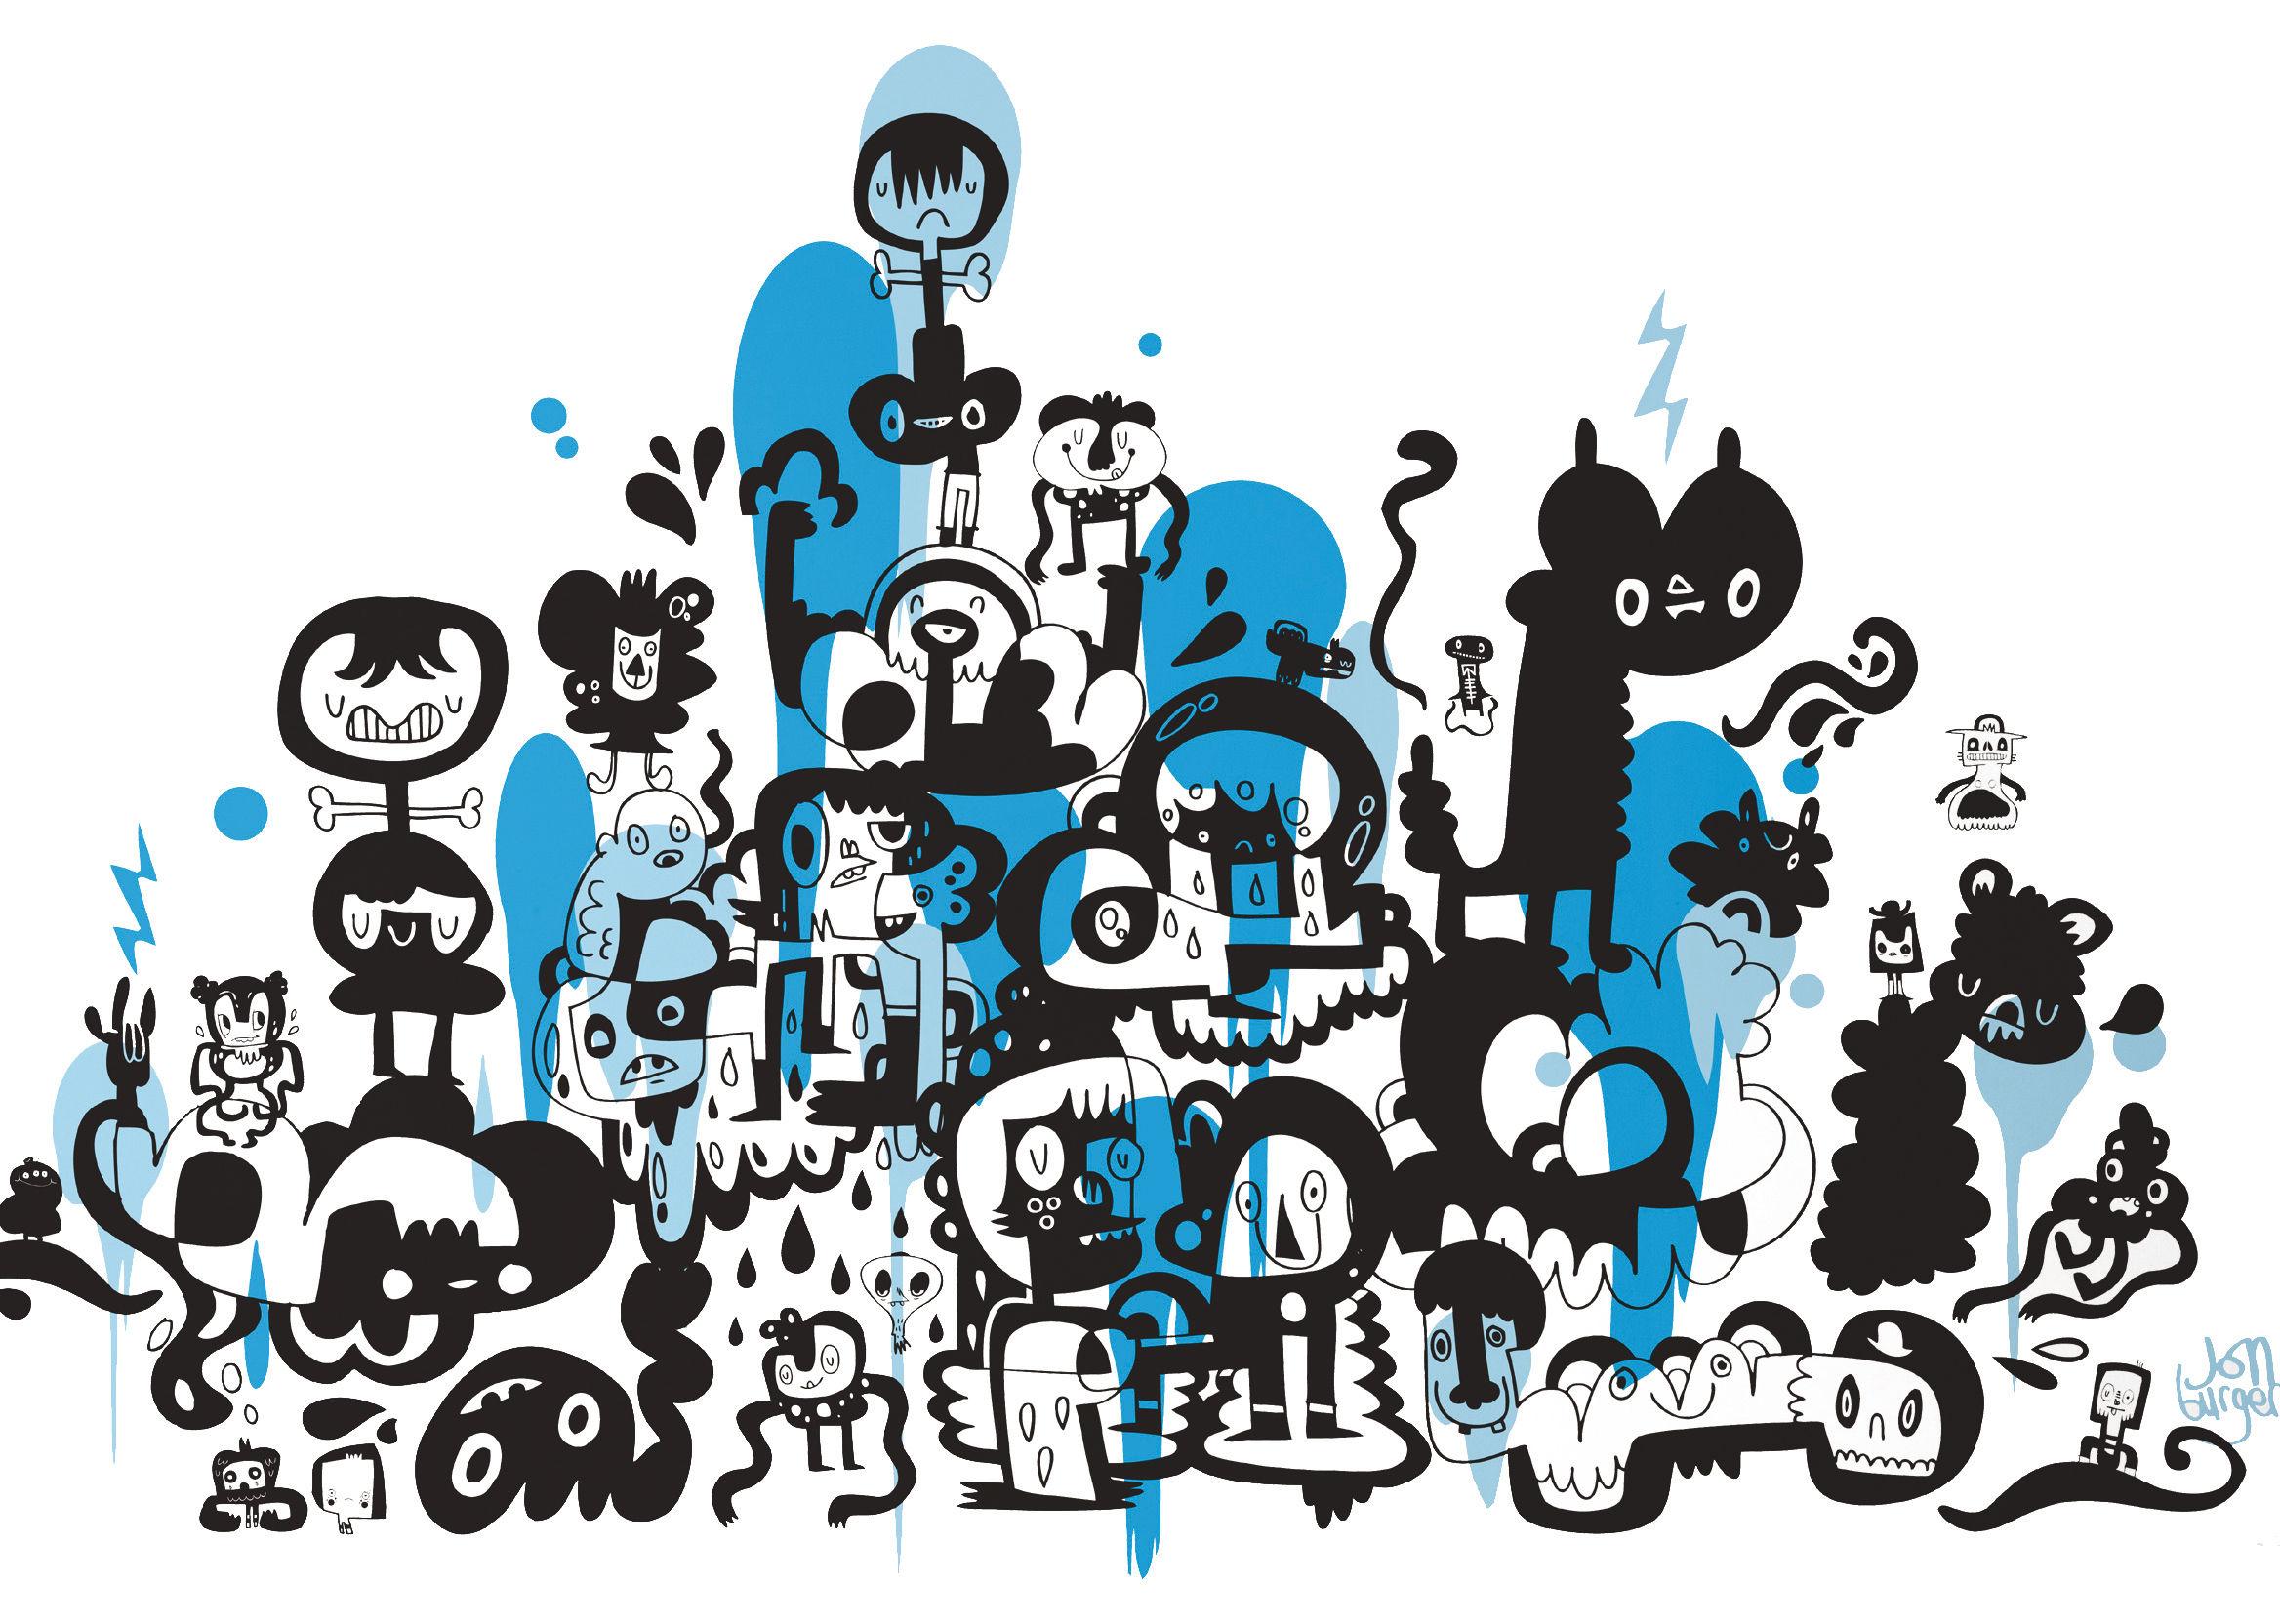 Dekoration - Stickers und Tapeten - Adventures on doodle-safari 2 Sticker - Domestic - Blau - Vinyl